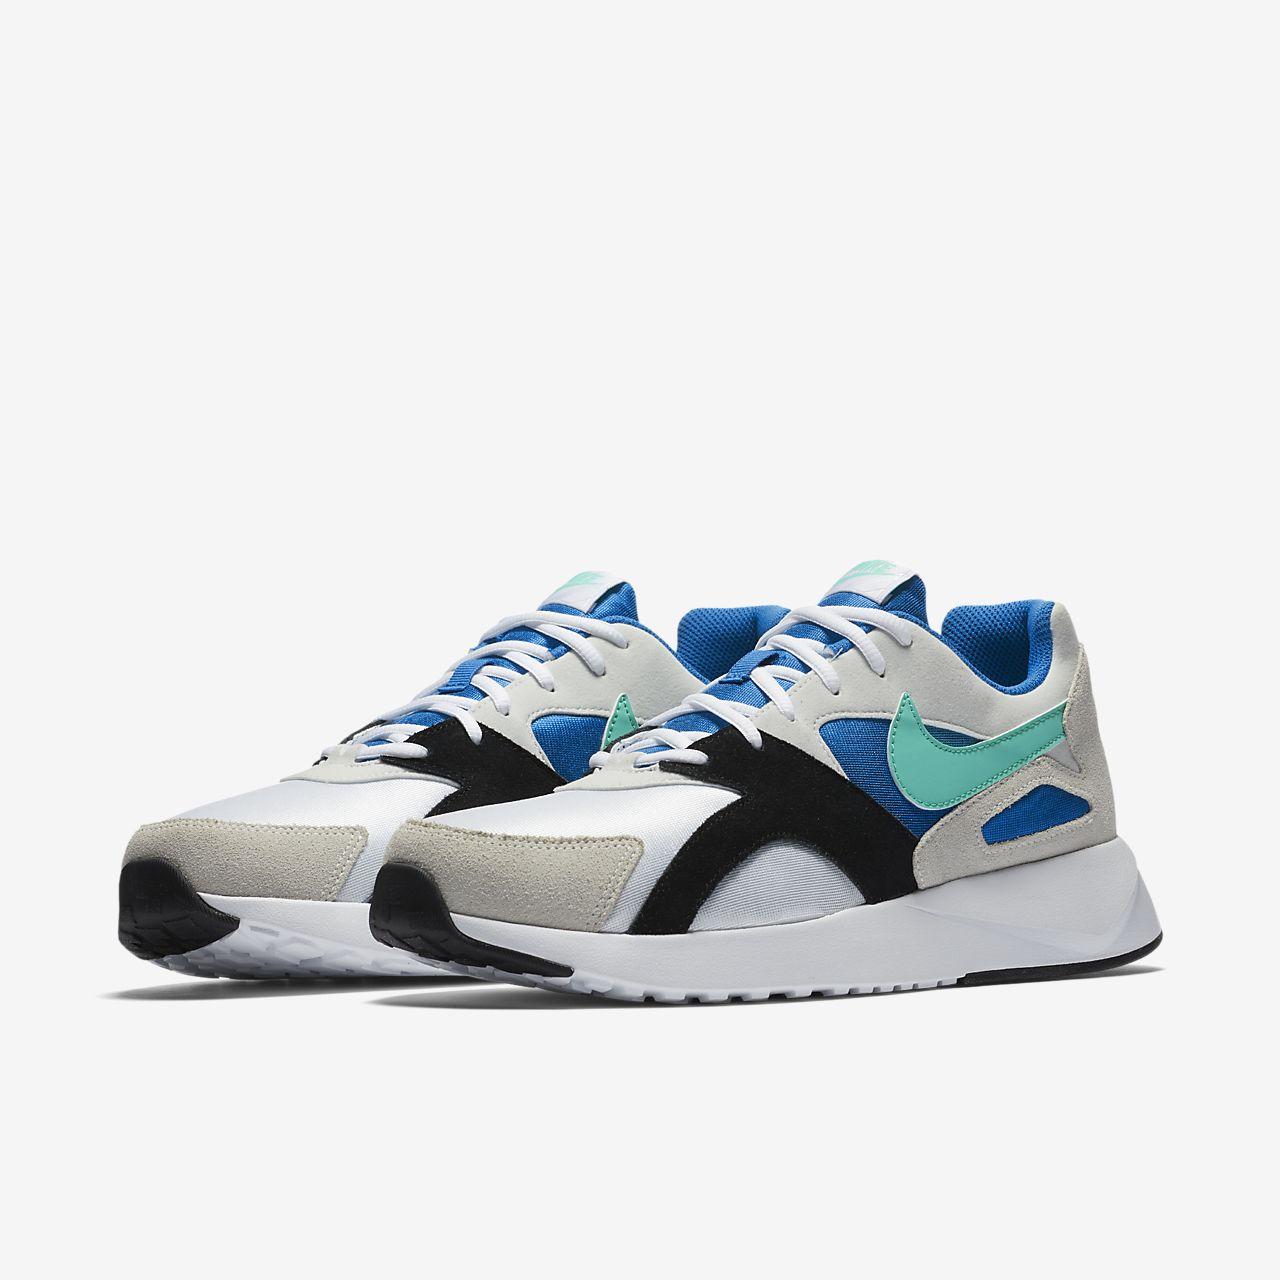 lowest price 2d1f3 1b6f7 Low Resolution Nike Pantheos Men s Shoe Nike Pantheos Men s Shoe